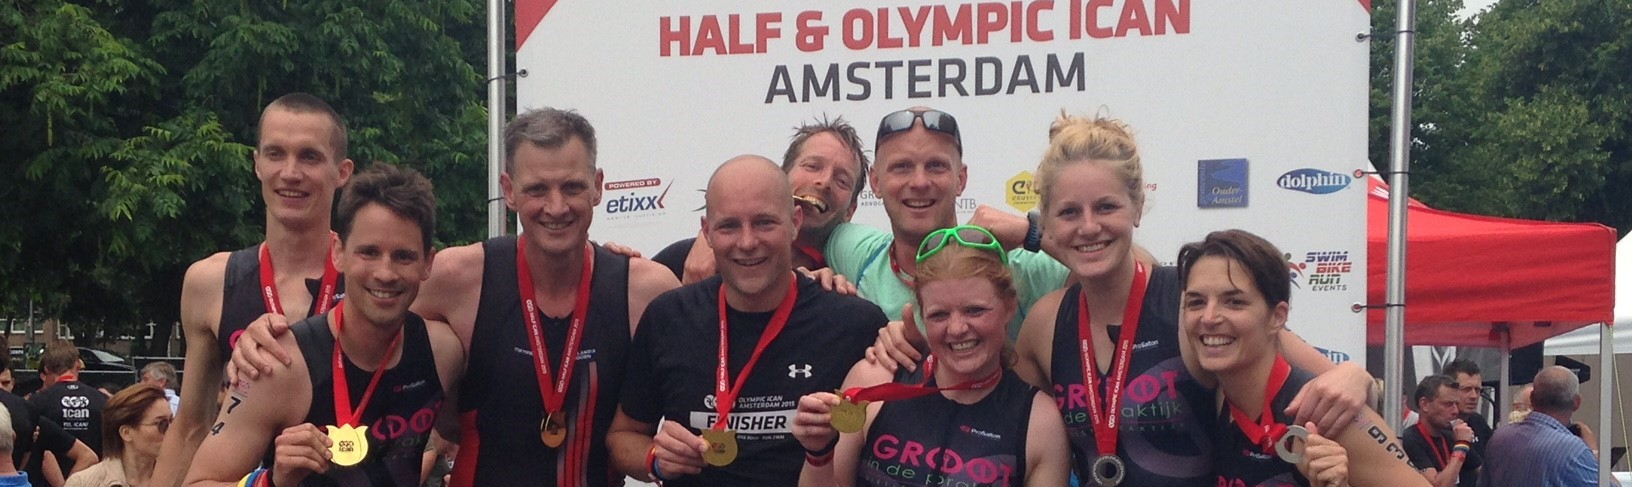 Triatlon Vereniging Hollandia Hoorn